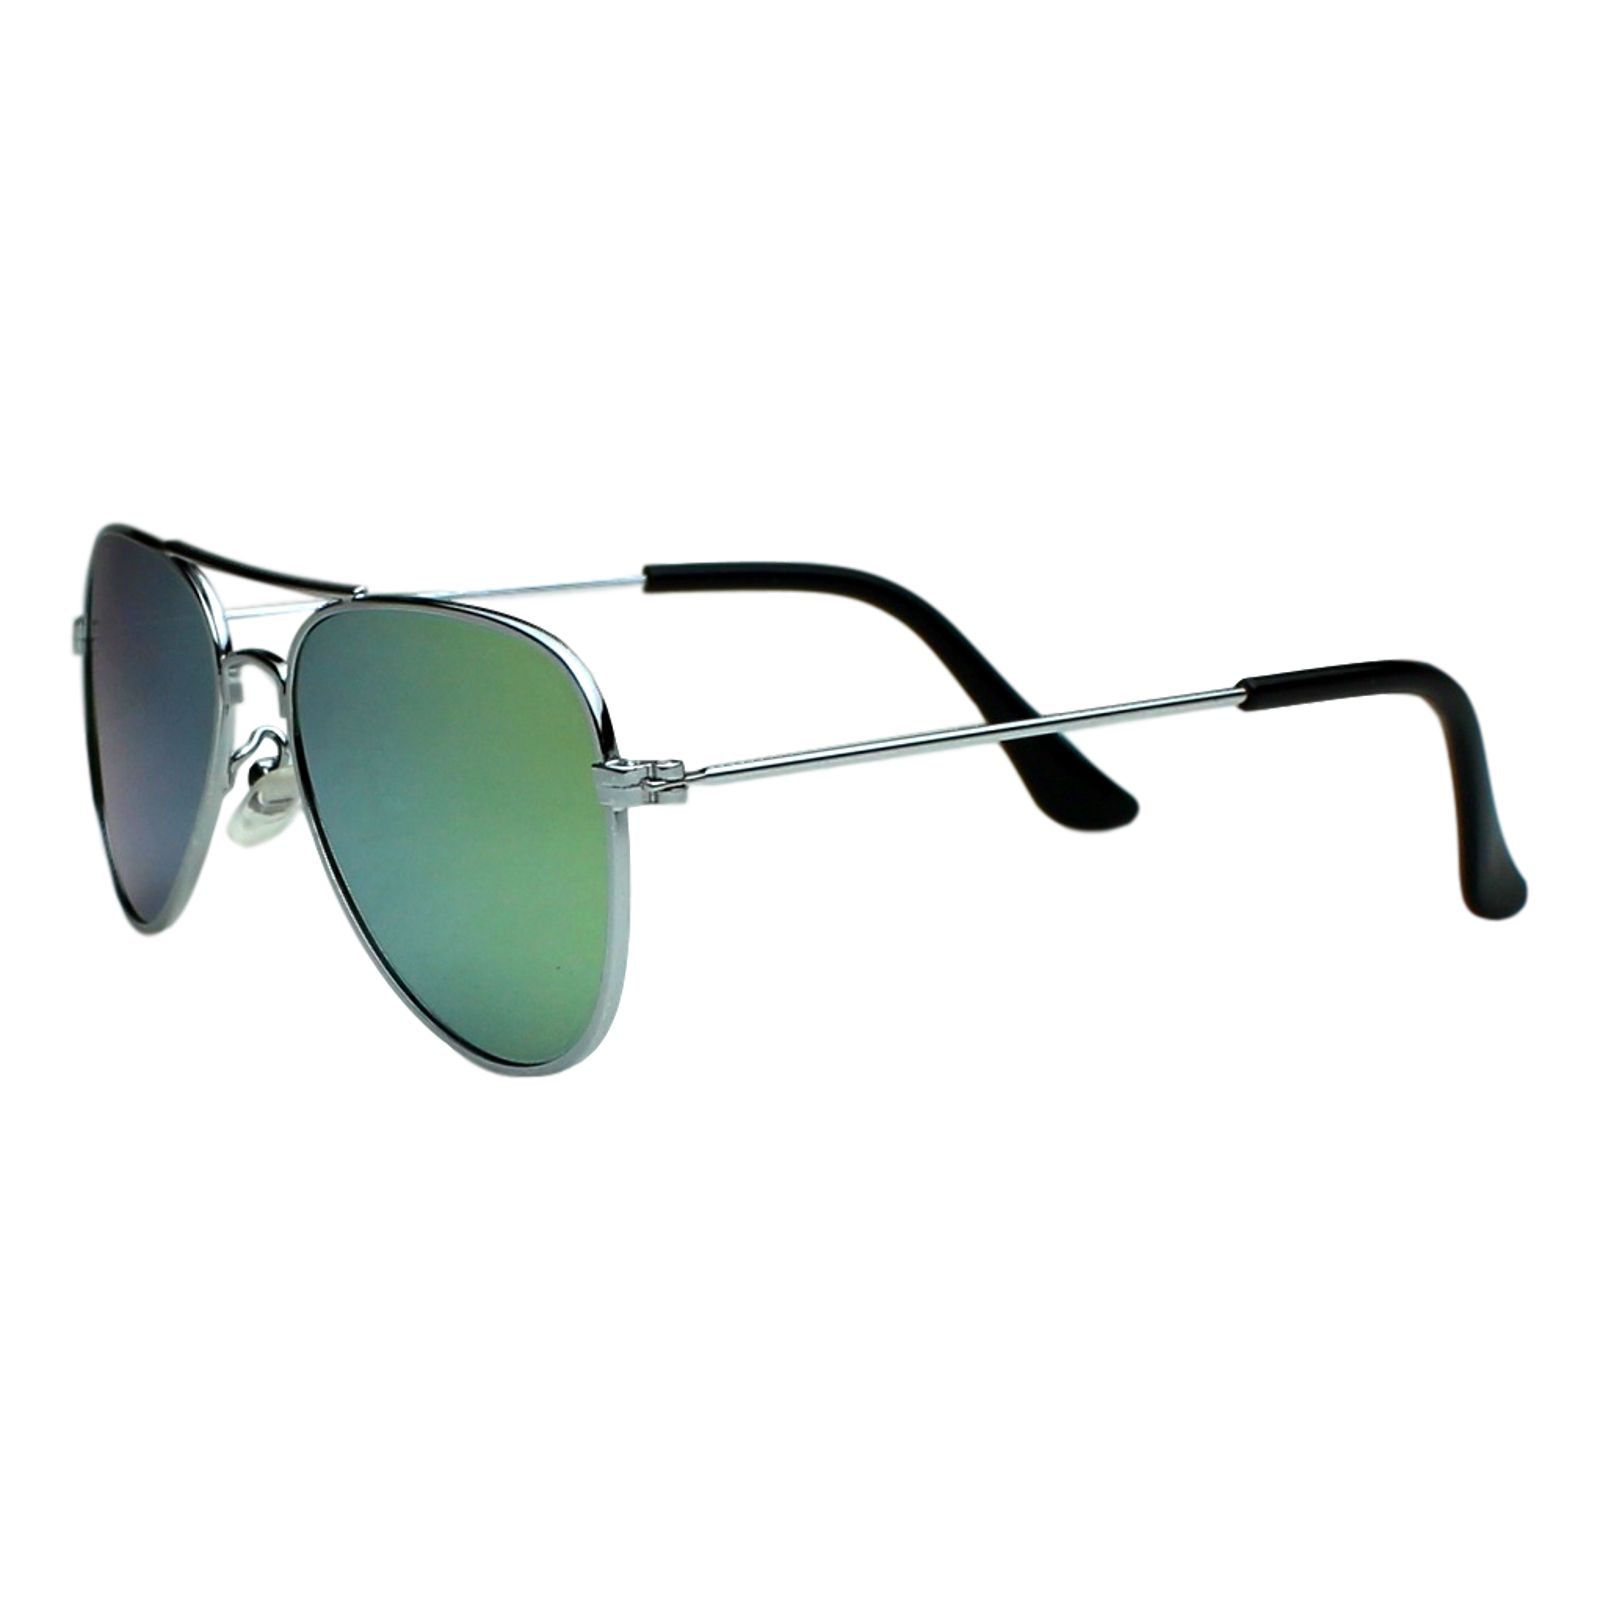 Óculos de Sol Díspar ID1902 infantil idade 3 a 6 anos Prata - Díspar Style  ... 7d3c9b8f85